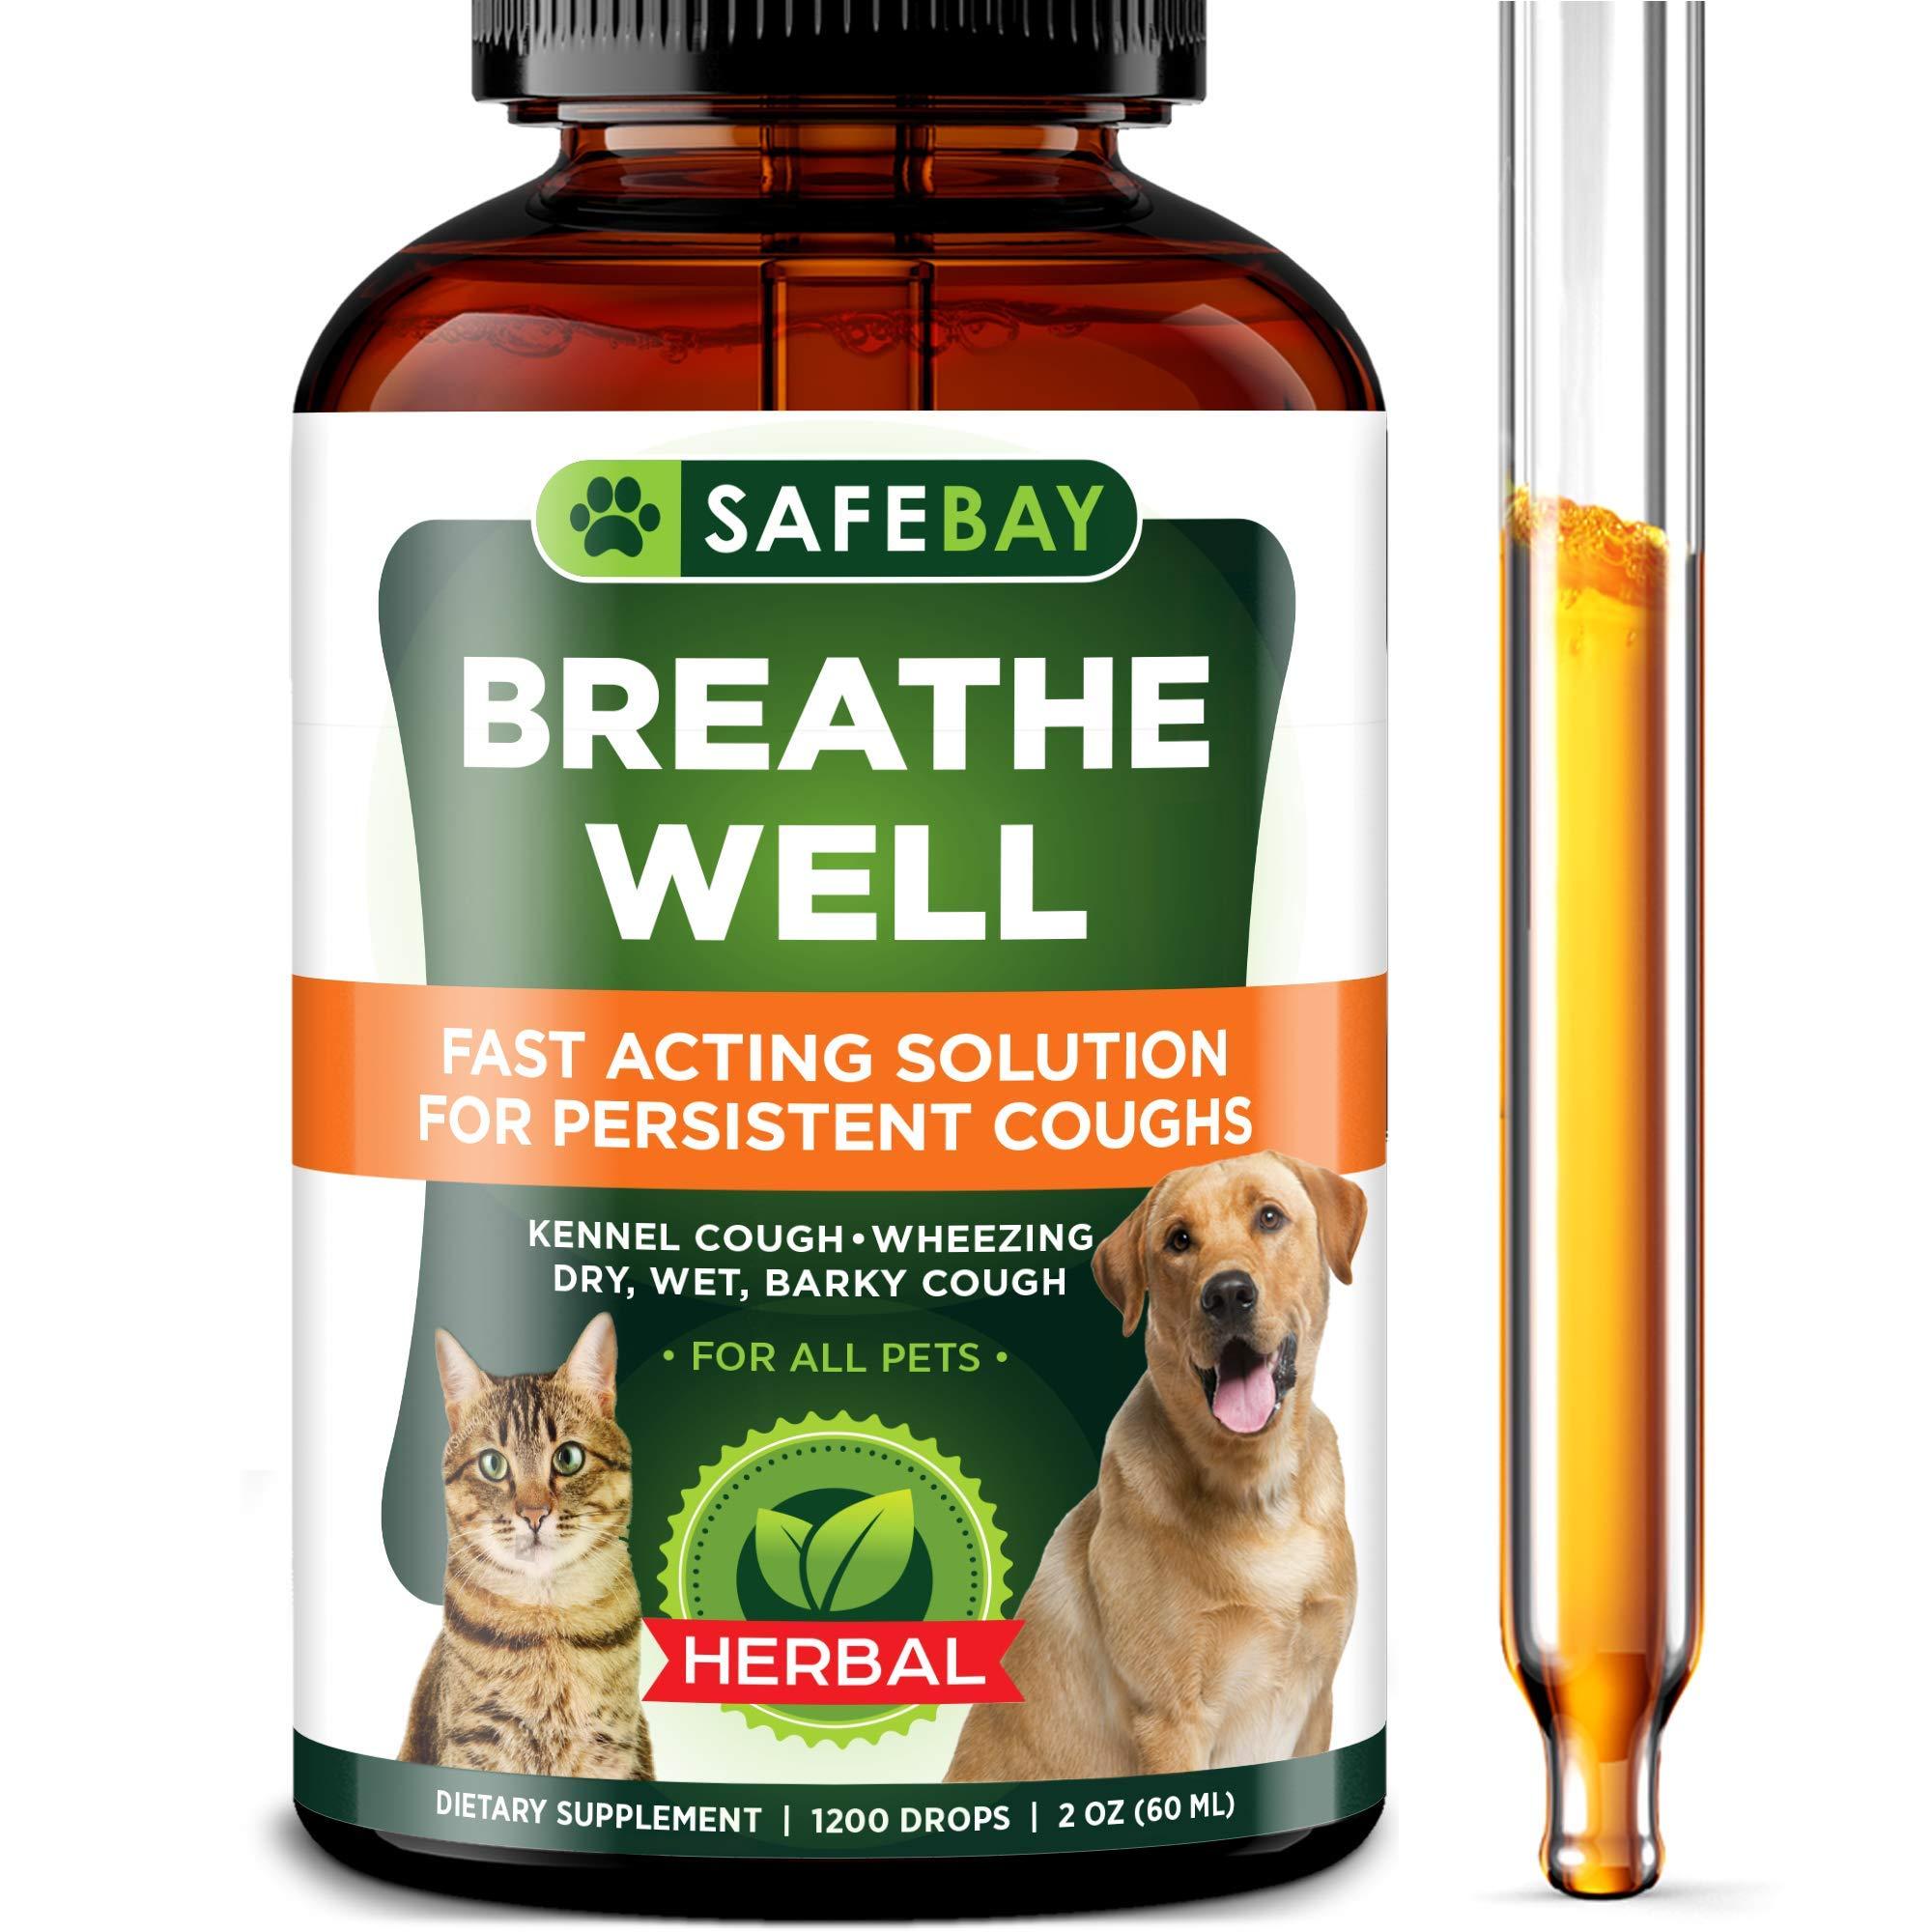 SafeBay Dog Supplement And Cat Supplement Premium Quality